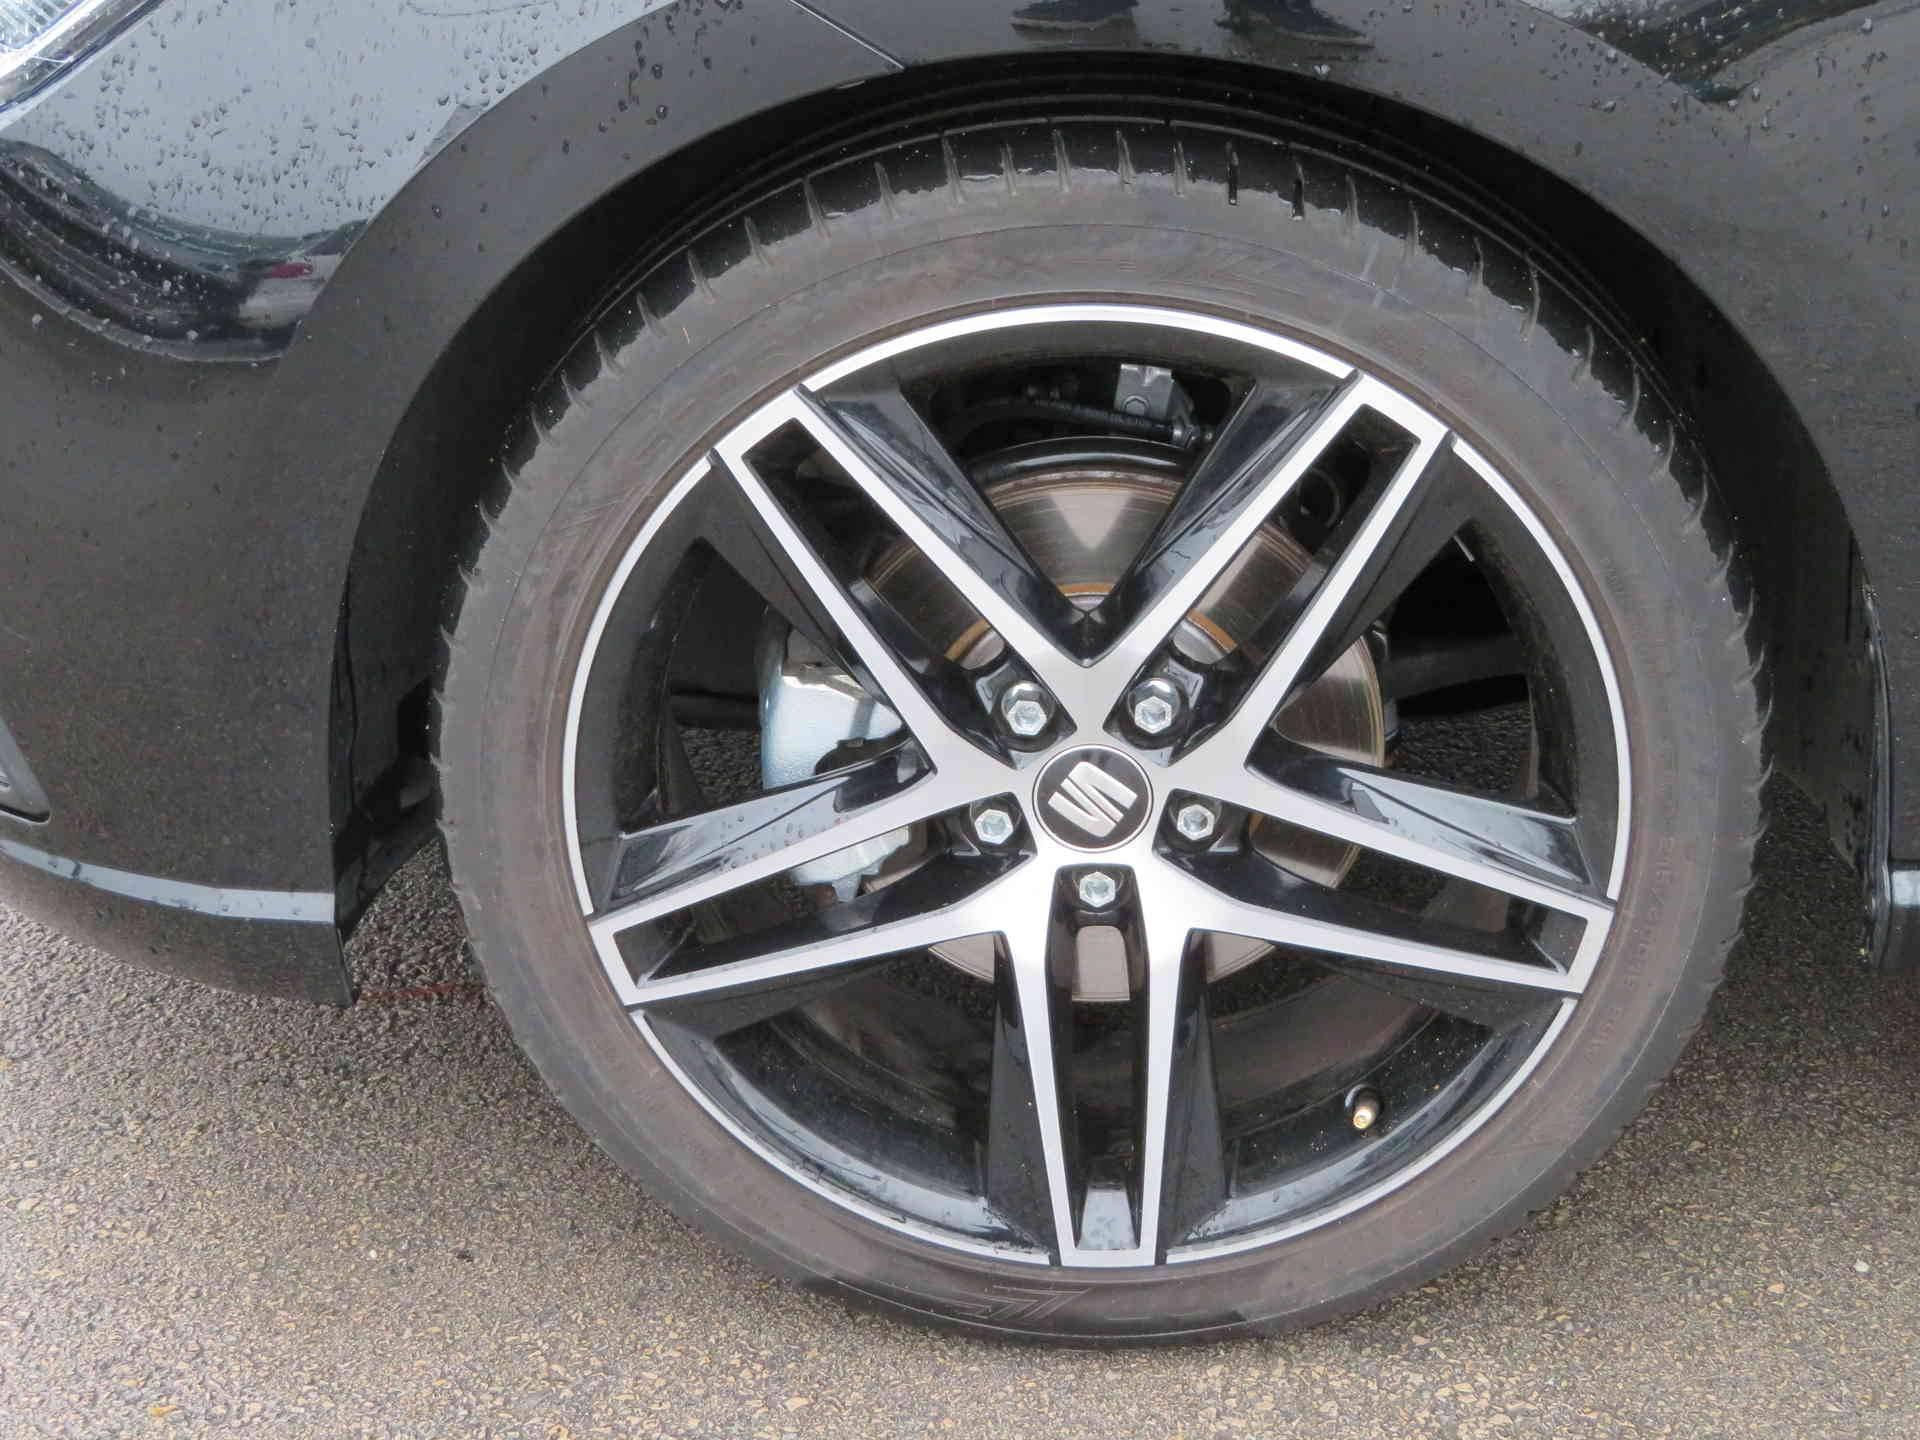 3 - Ibiza 1.0 EcoTSI 115 ch S/S BVM6